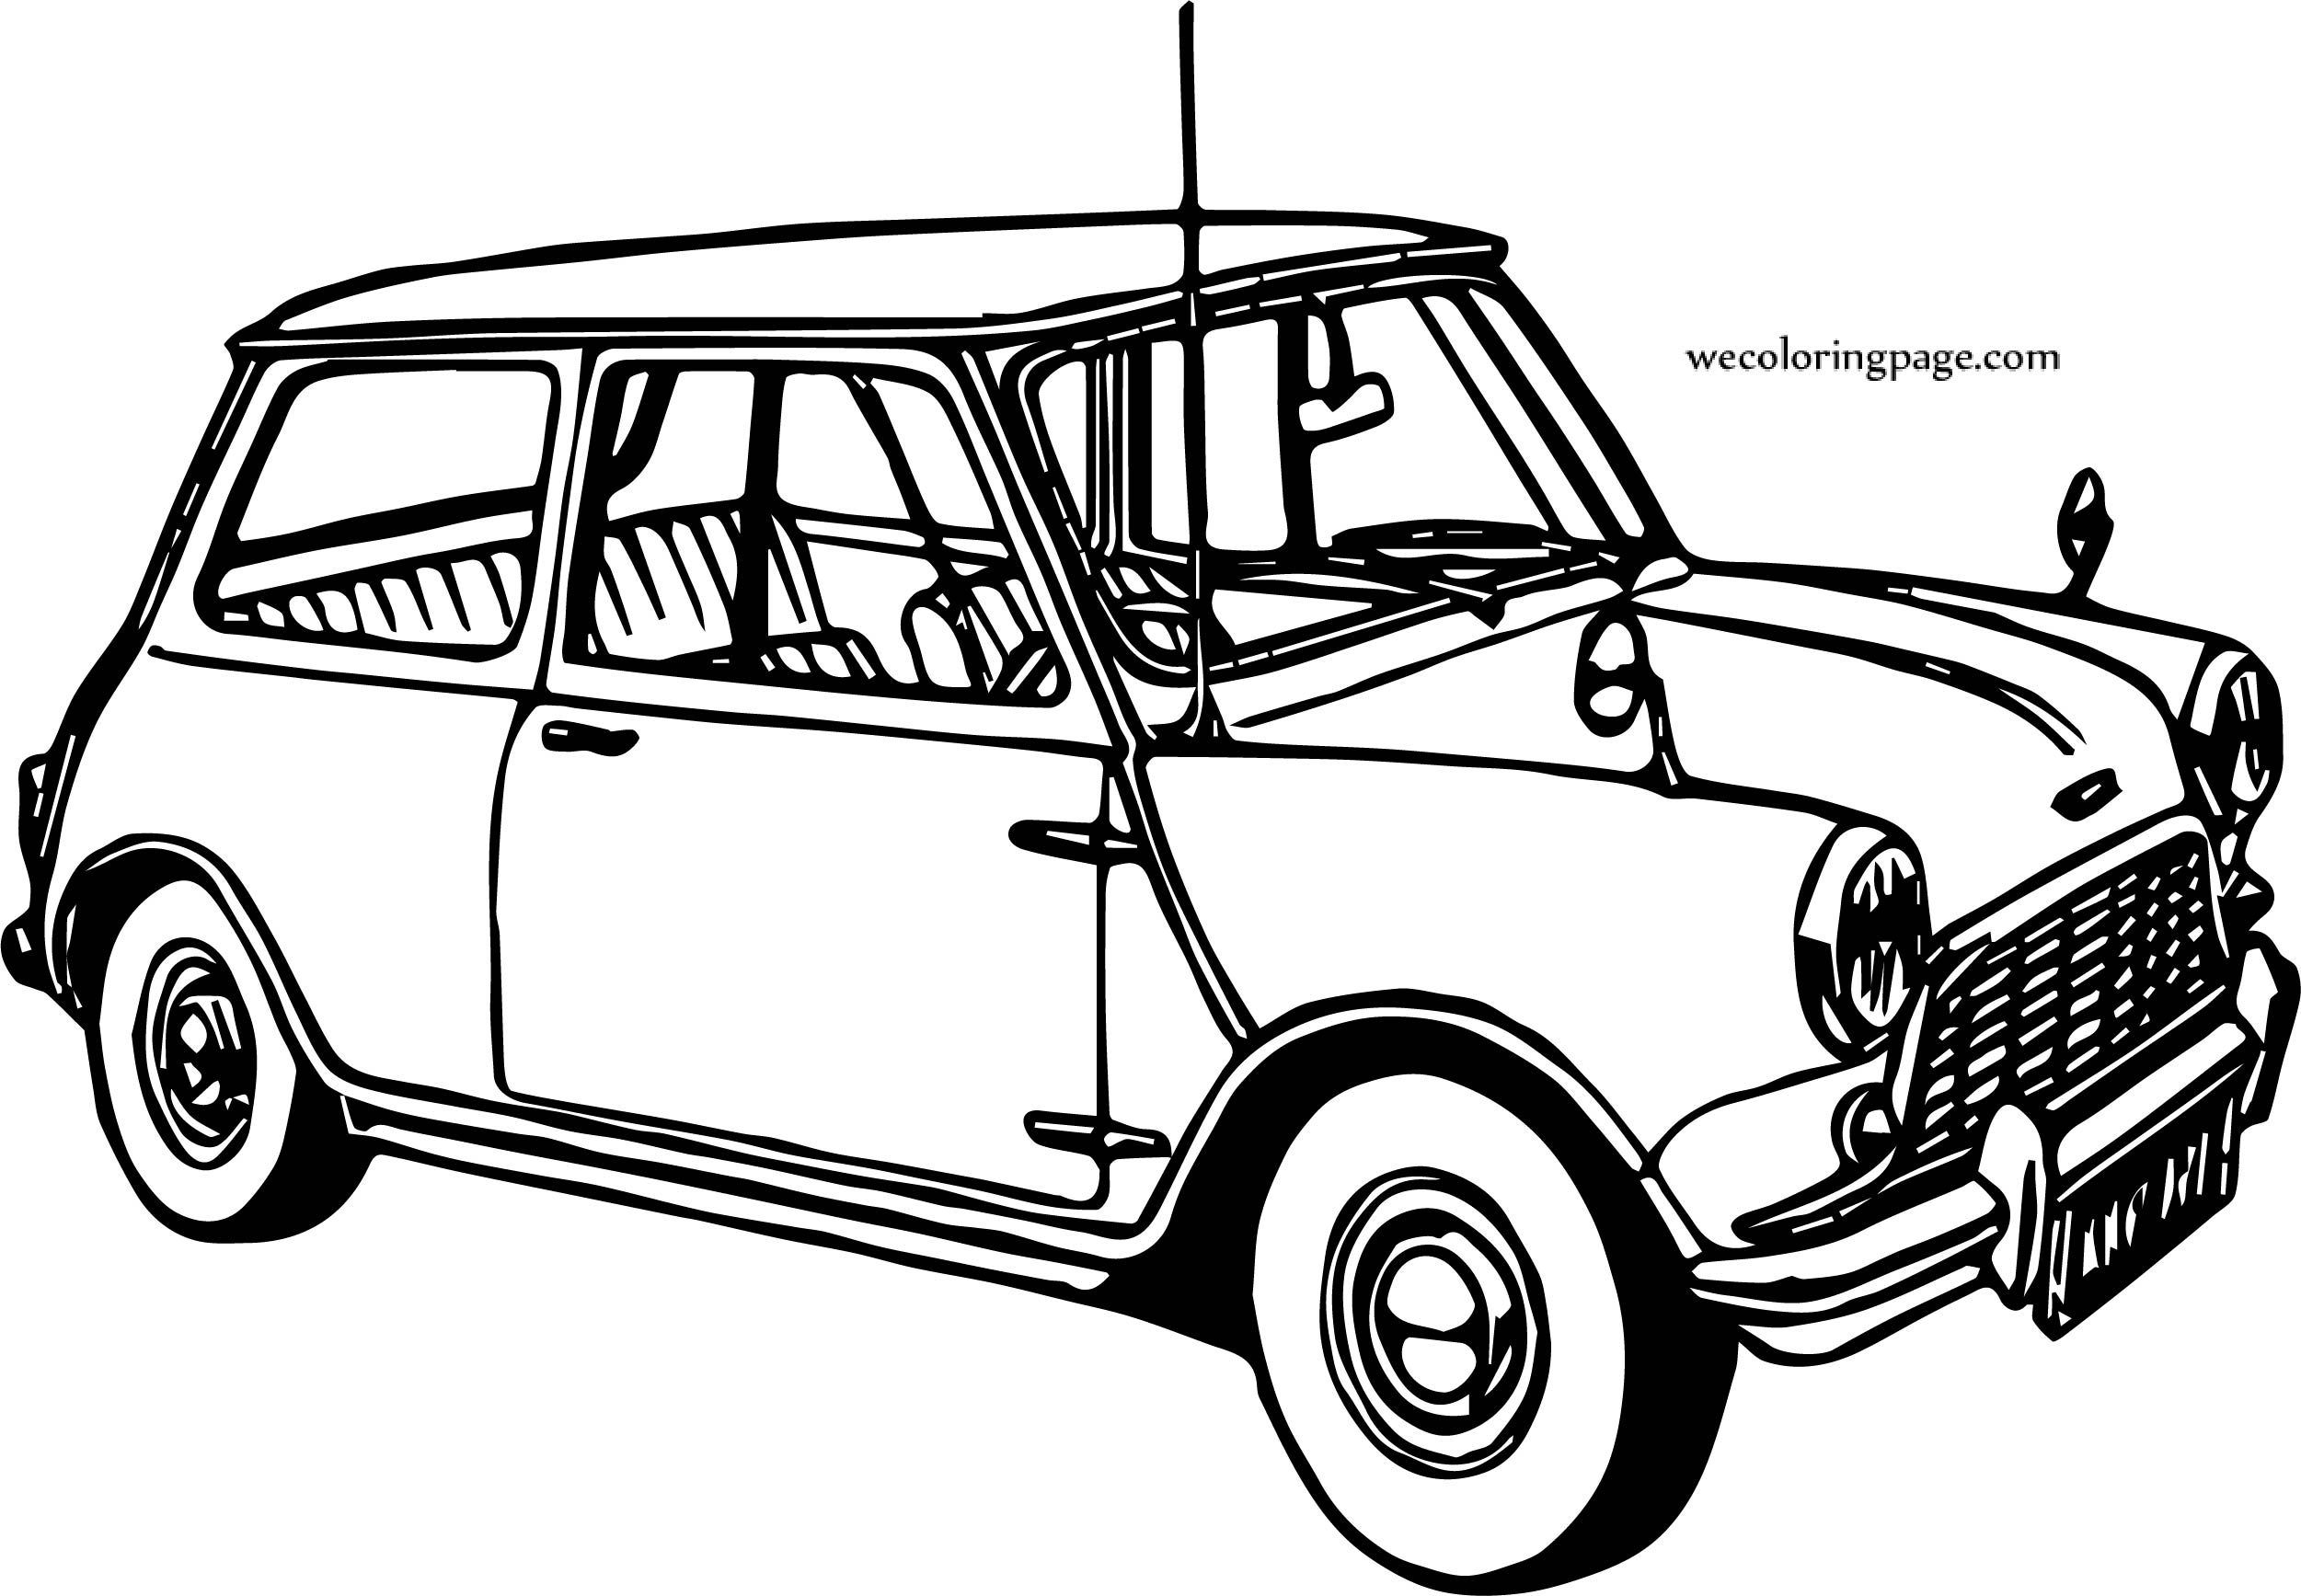 vintage car coloring pages - photo#32